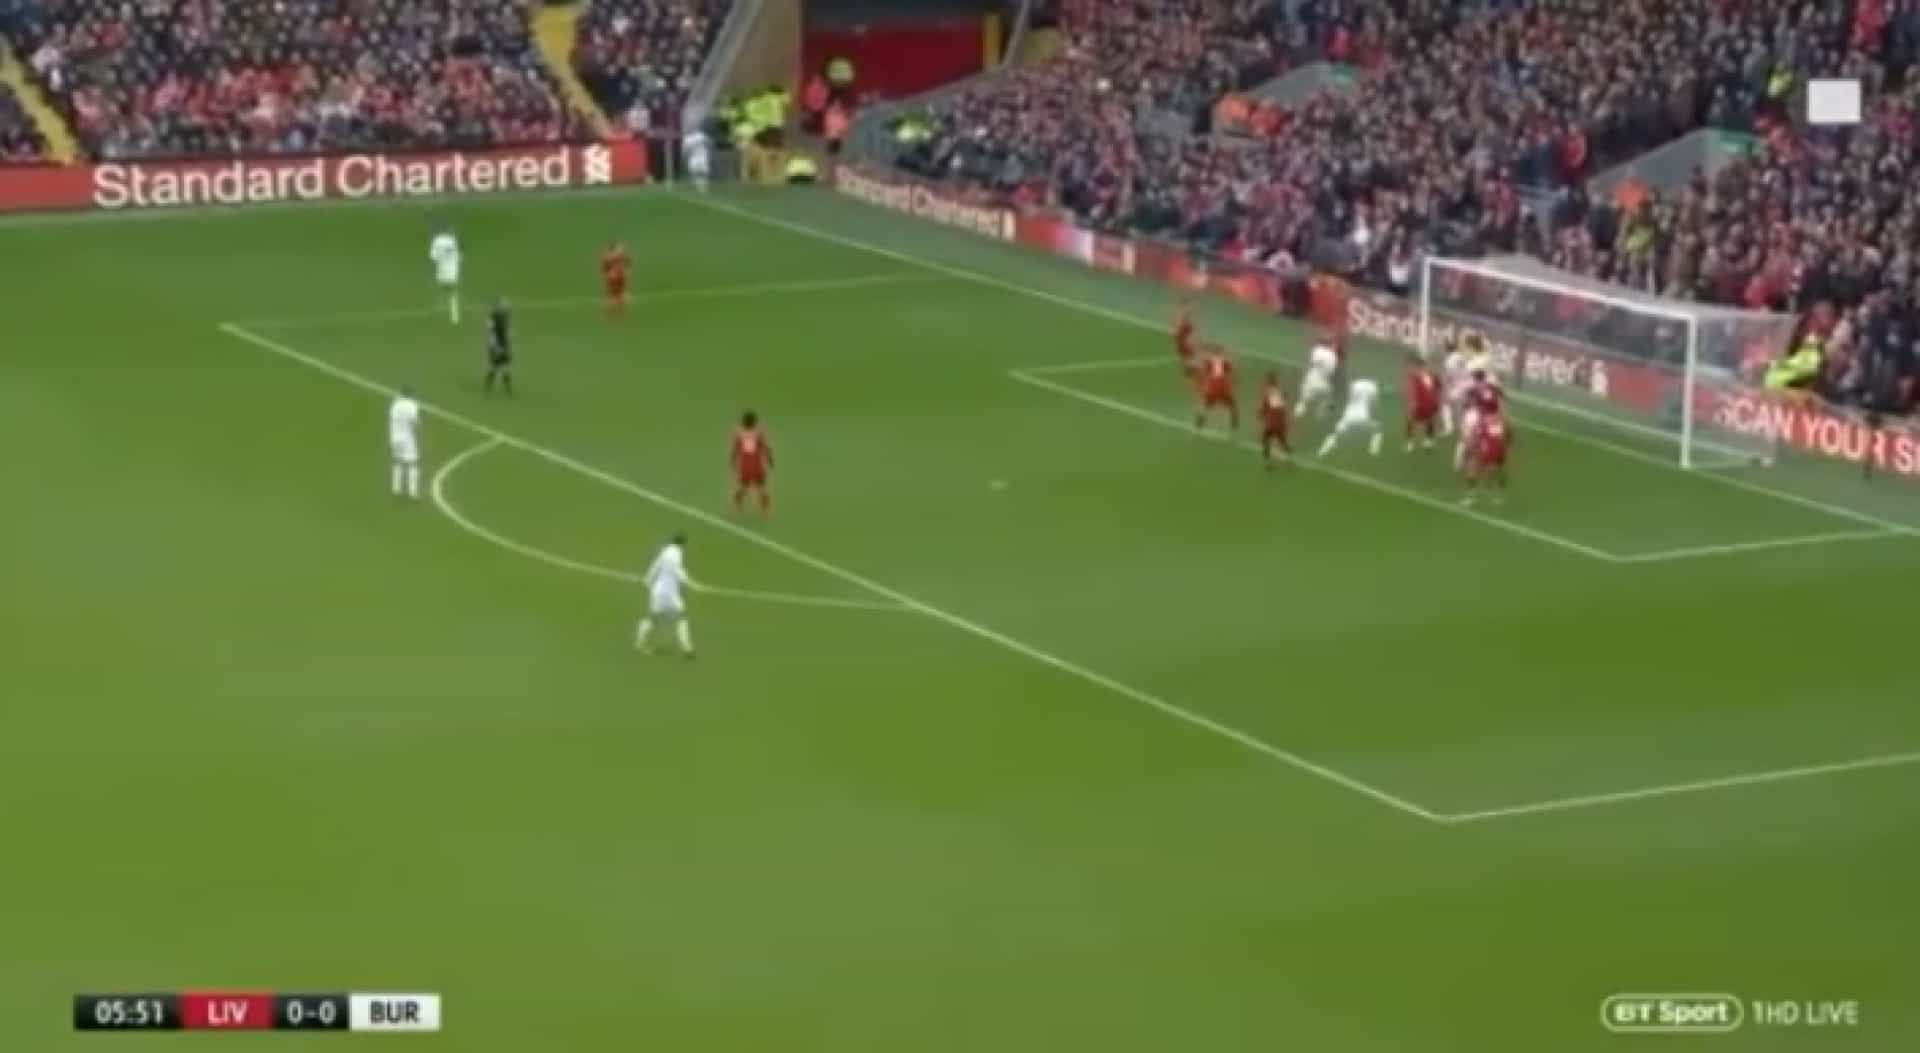 Burnley surpreendeu Liverpool com golo olímpico em Anfield Road